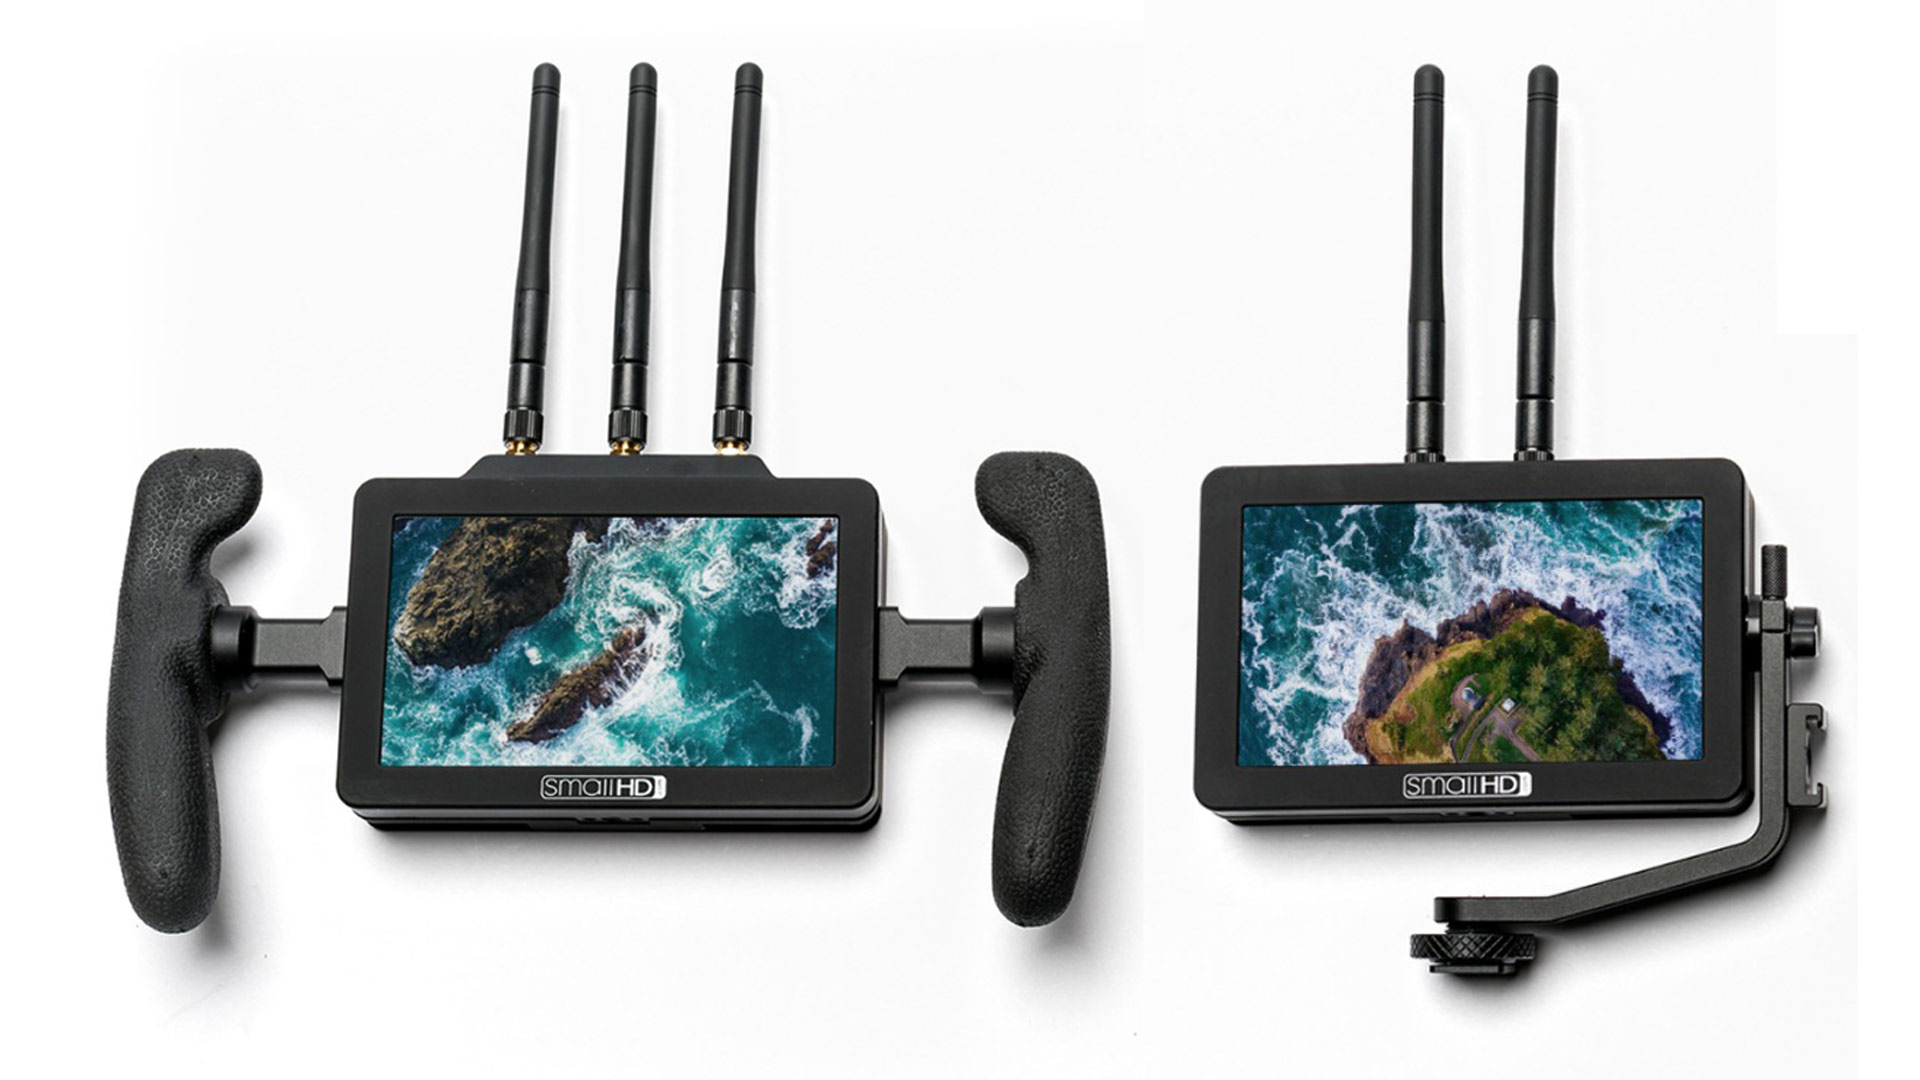 SmallHDとTeradekがFOCUS Bolt TX とBolt RXワイヤレスモニターを発表